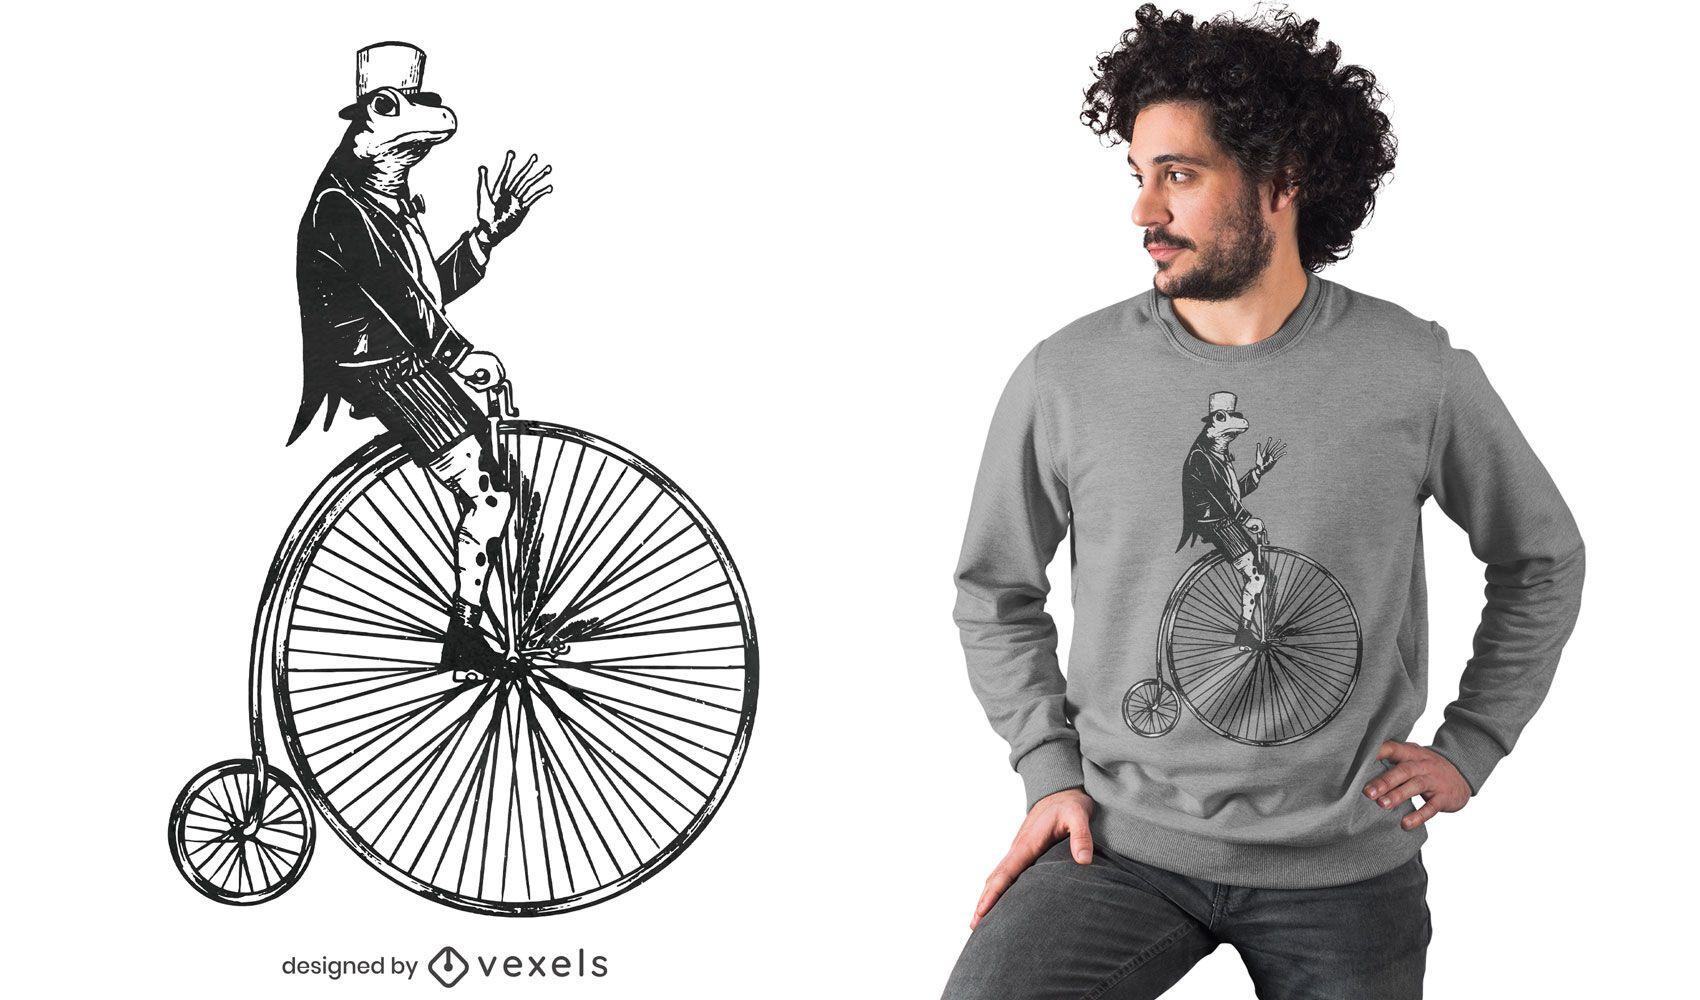 Dise?o de camiseta de rana de rueda alta.